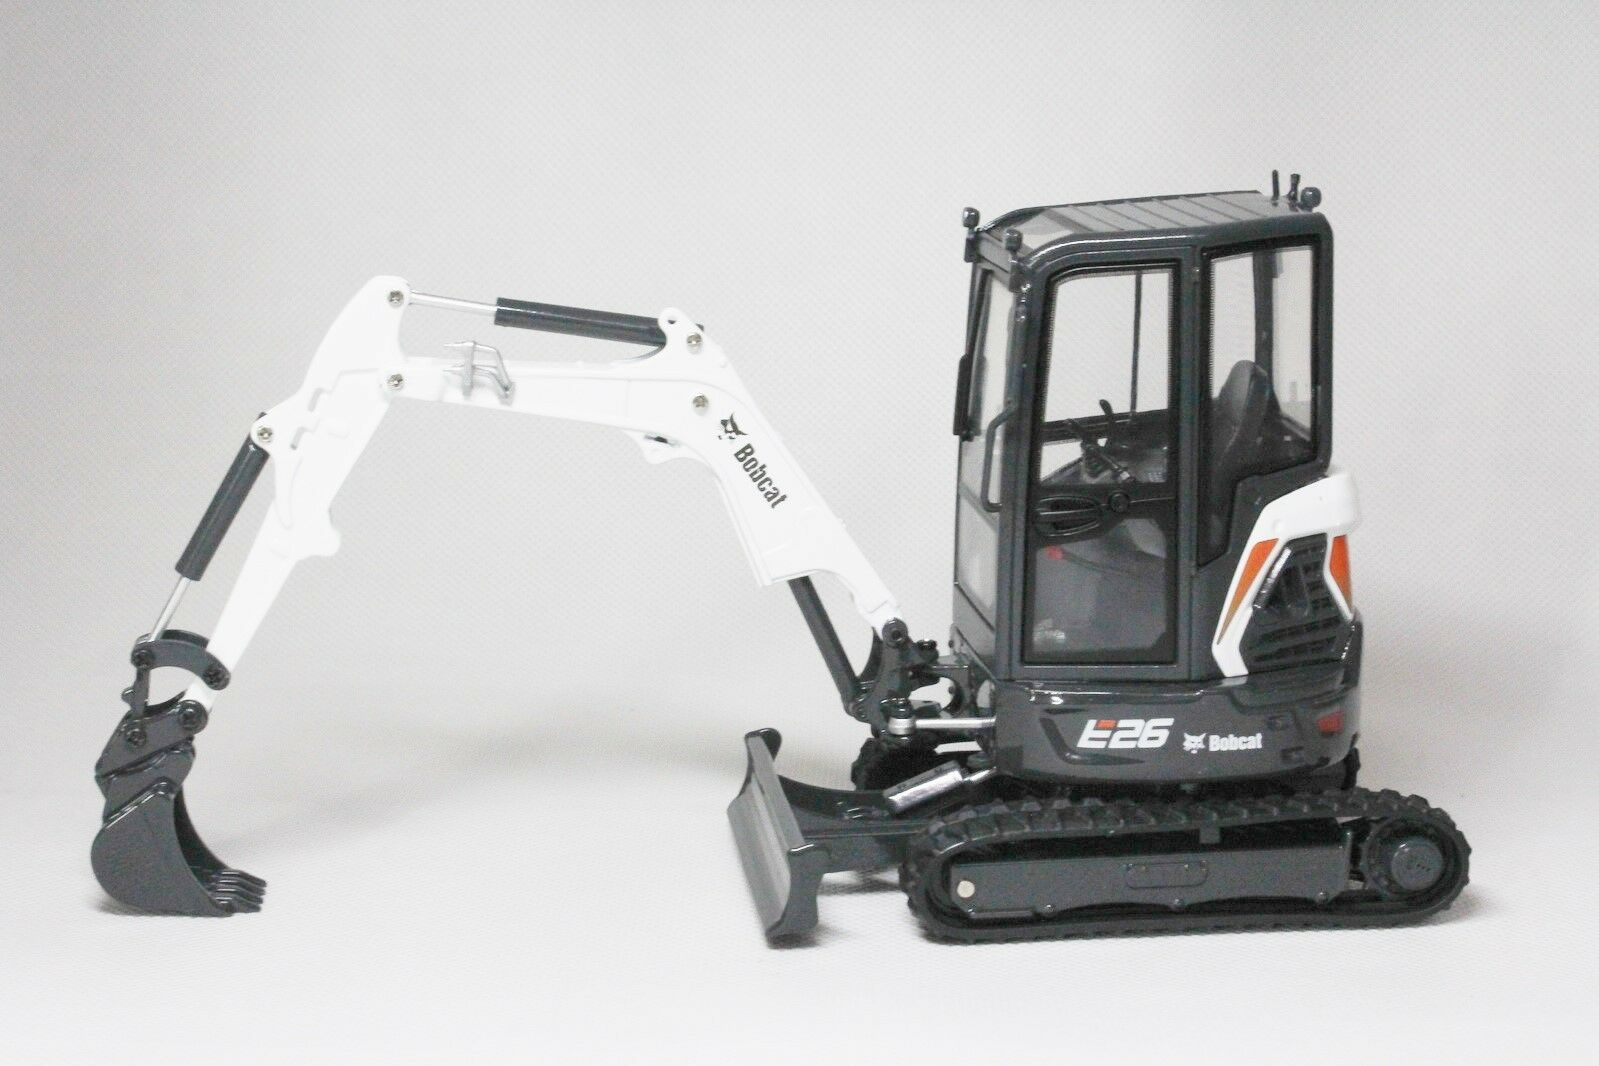 1 25 BOBCAT EQUIPMENT Model E26 Compact Excavator DIECAST Universal Universal Universal Hobbies 8132 e648f5